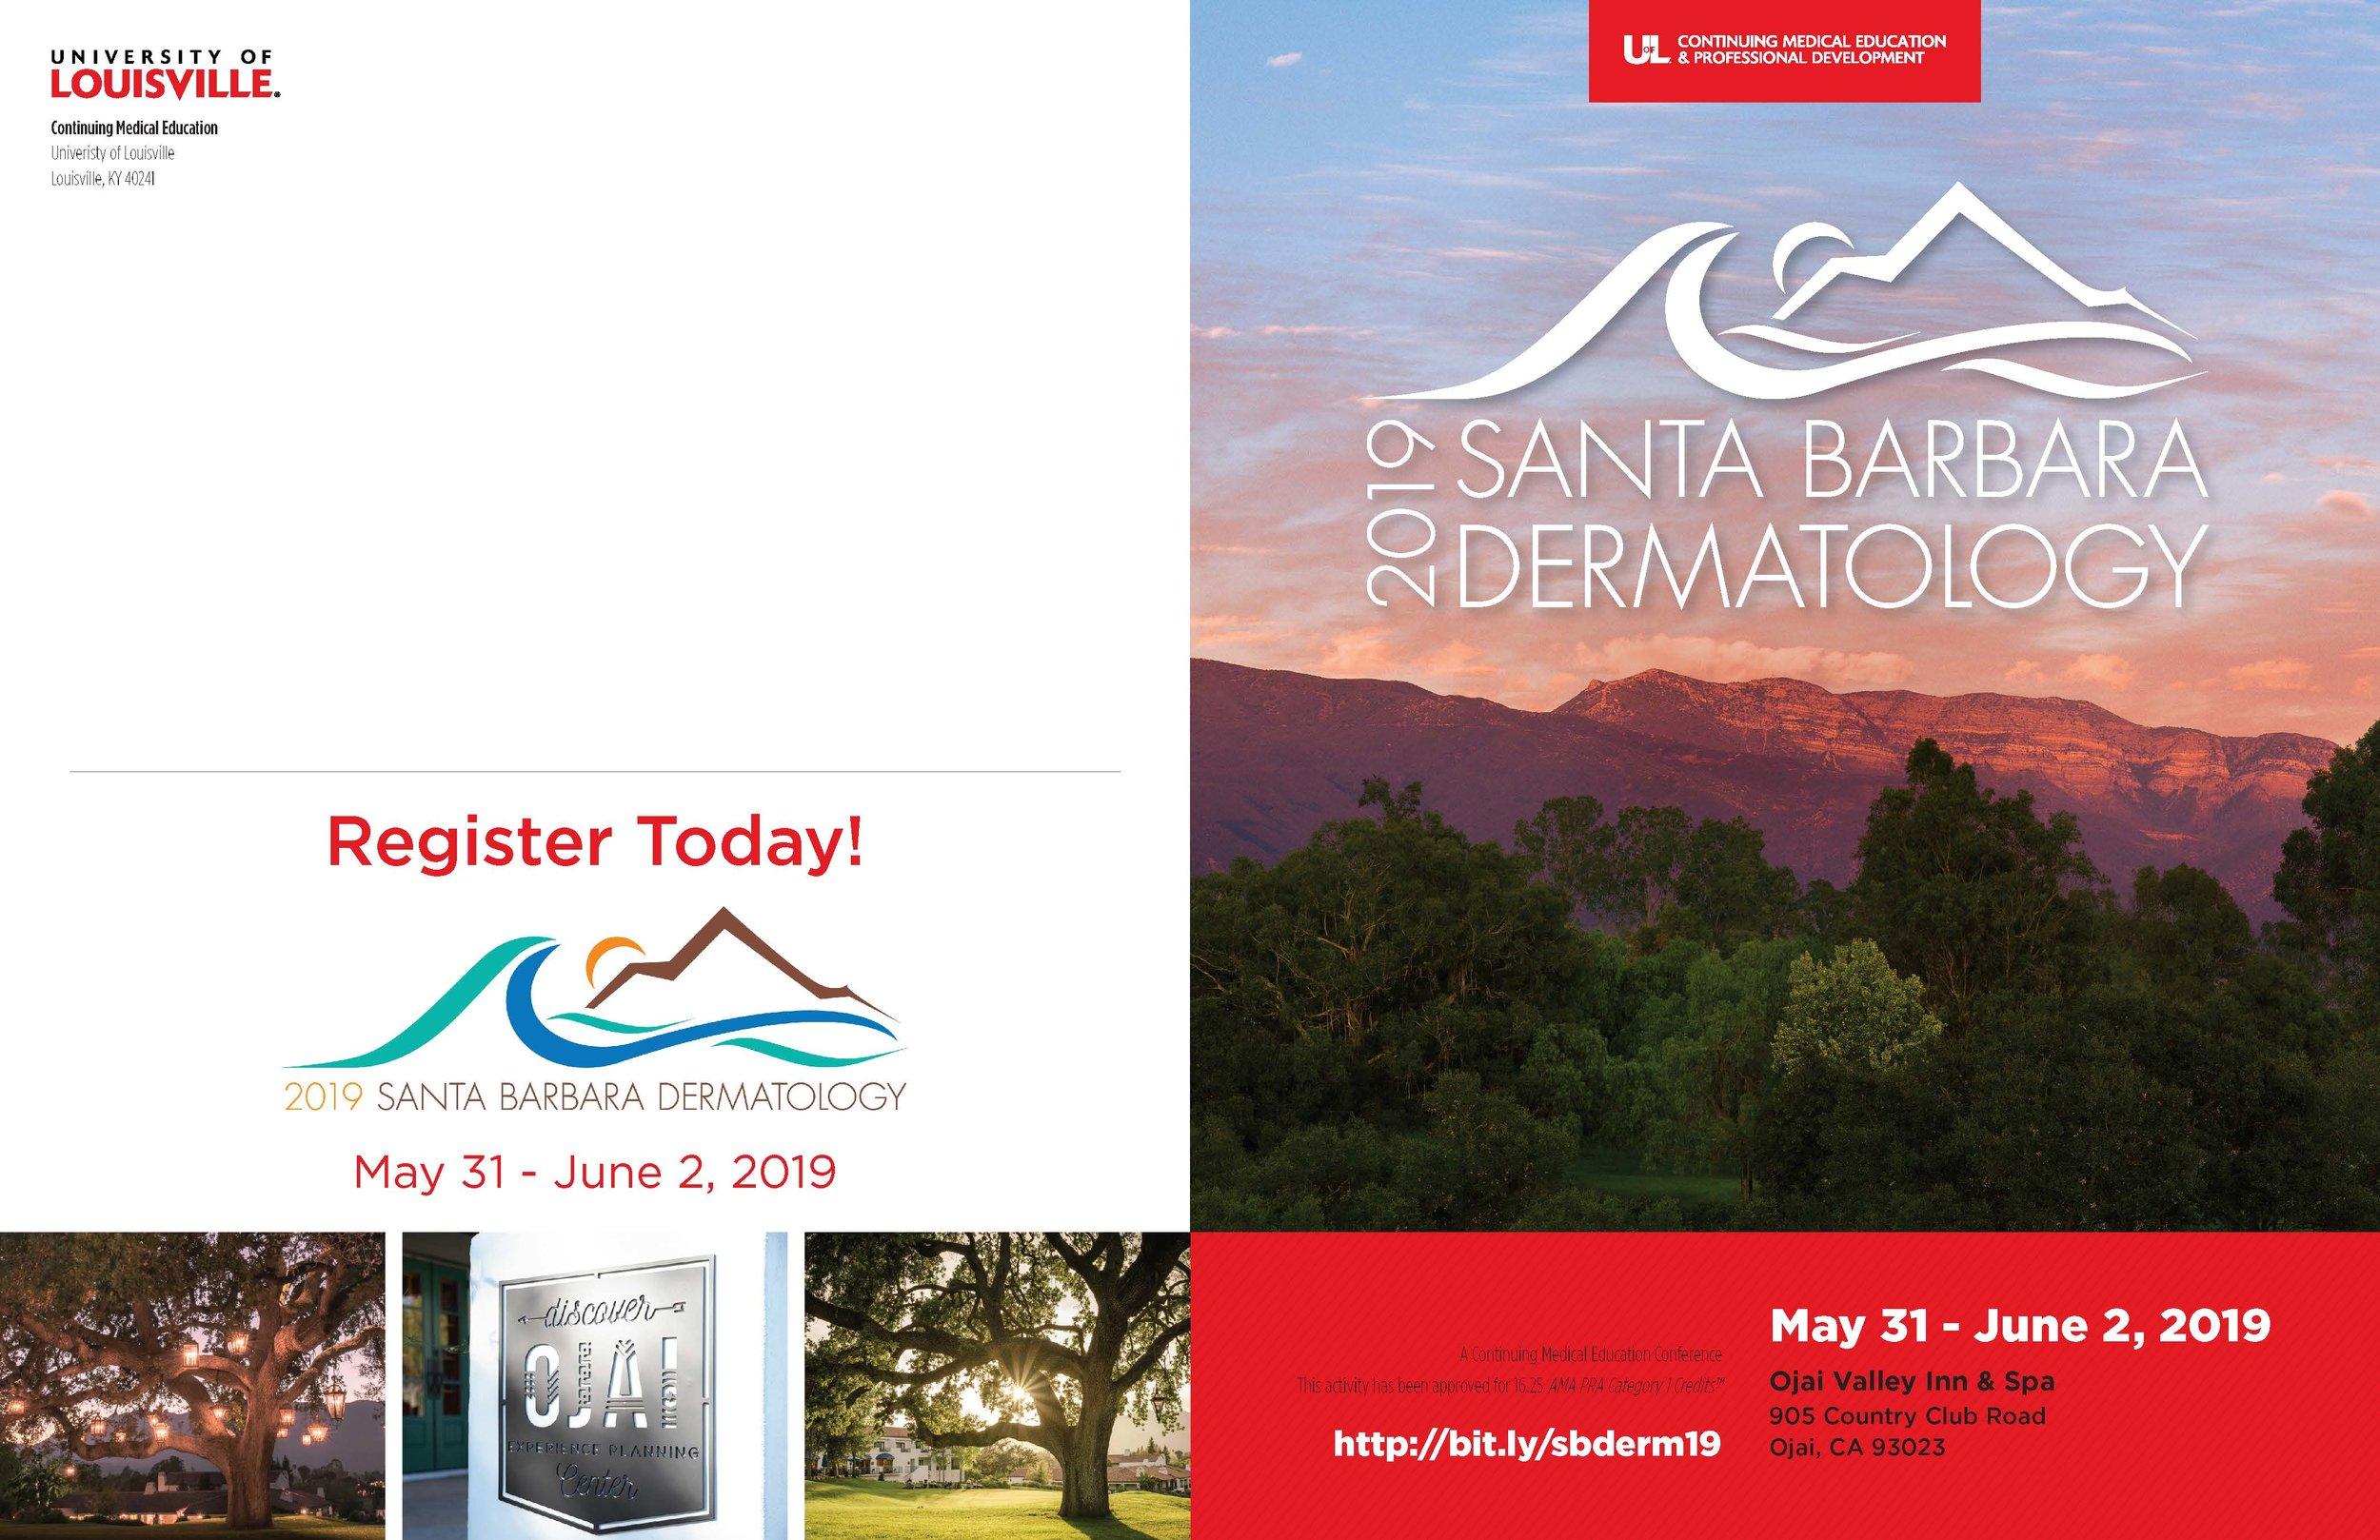 BRCH-Santa Barbara Dermatology 2019_Page_1.jpg